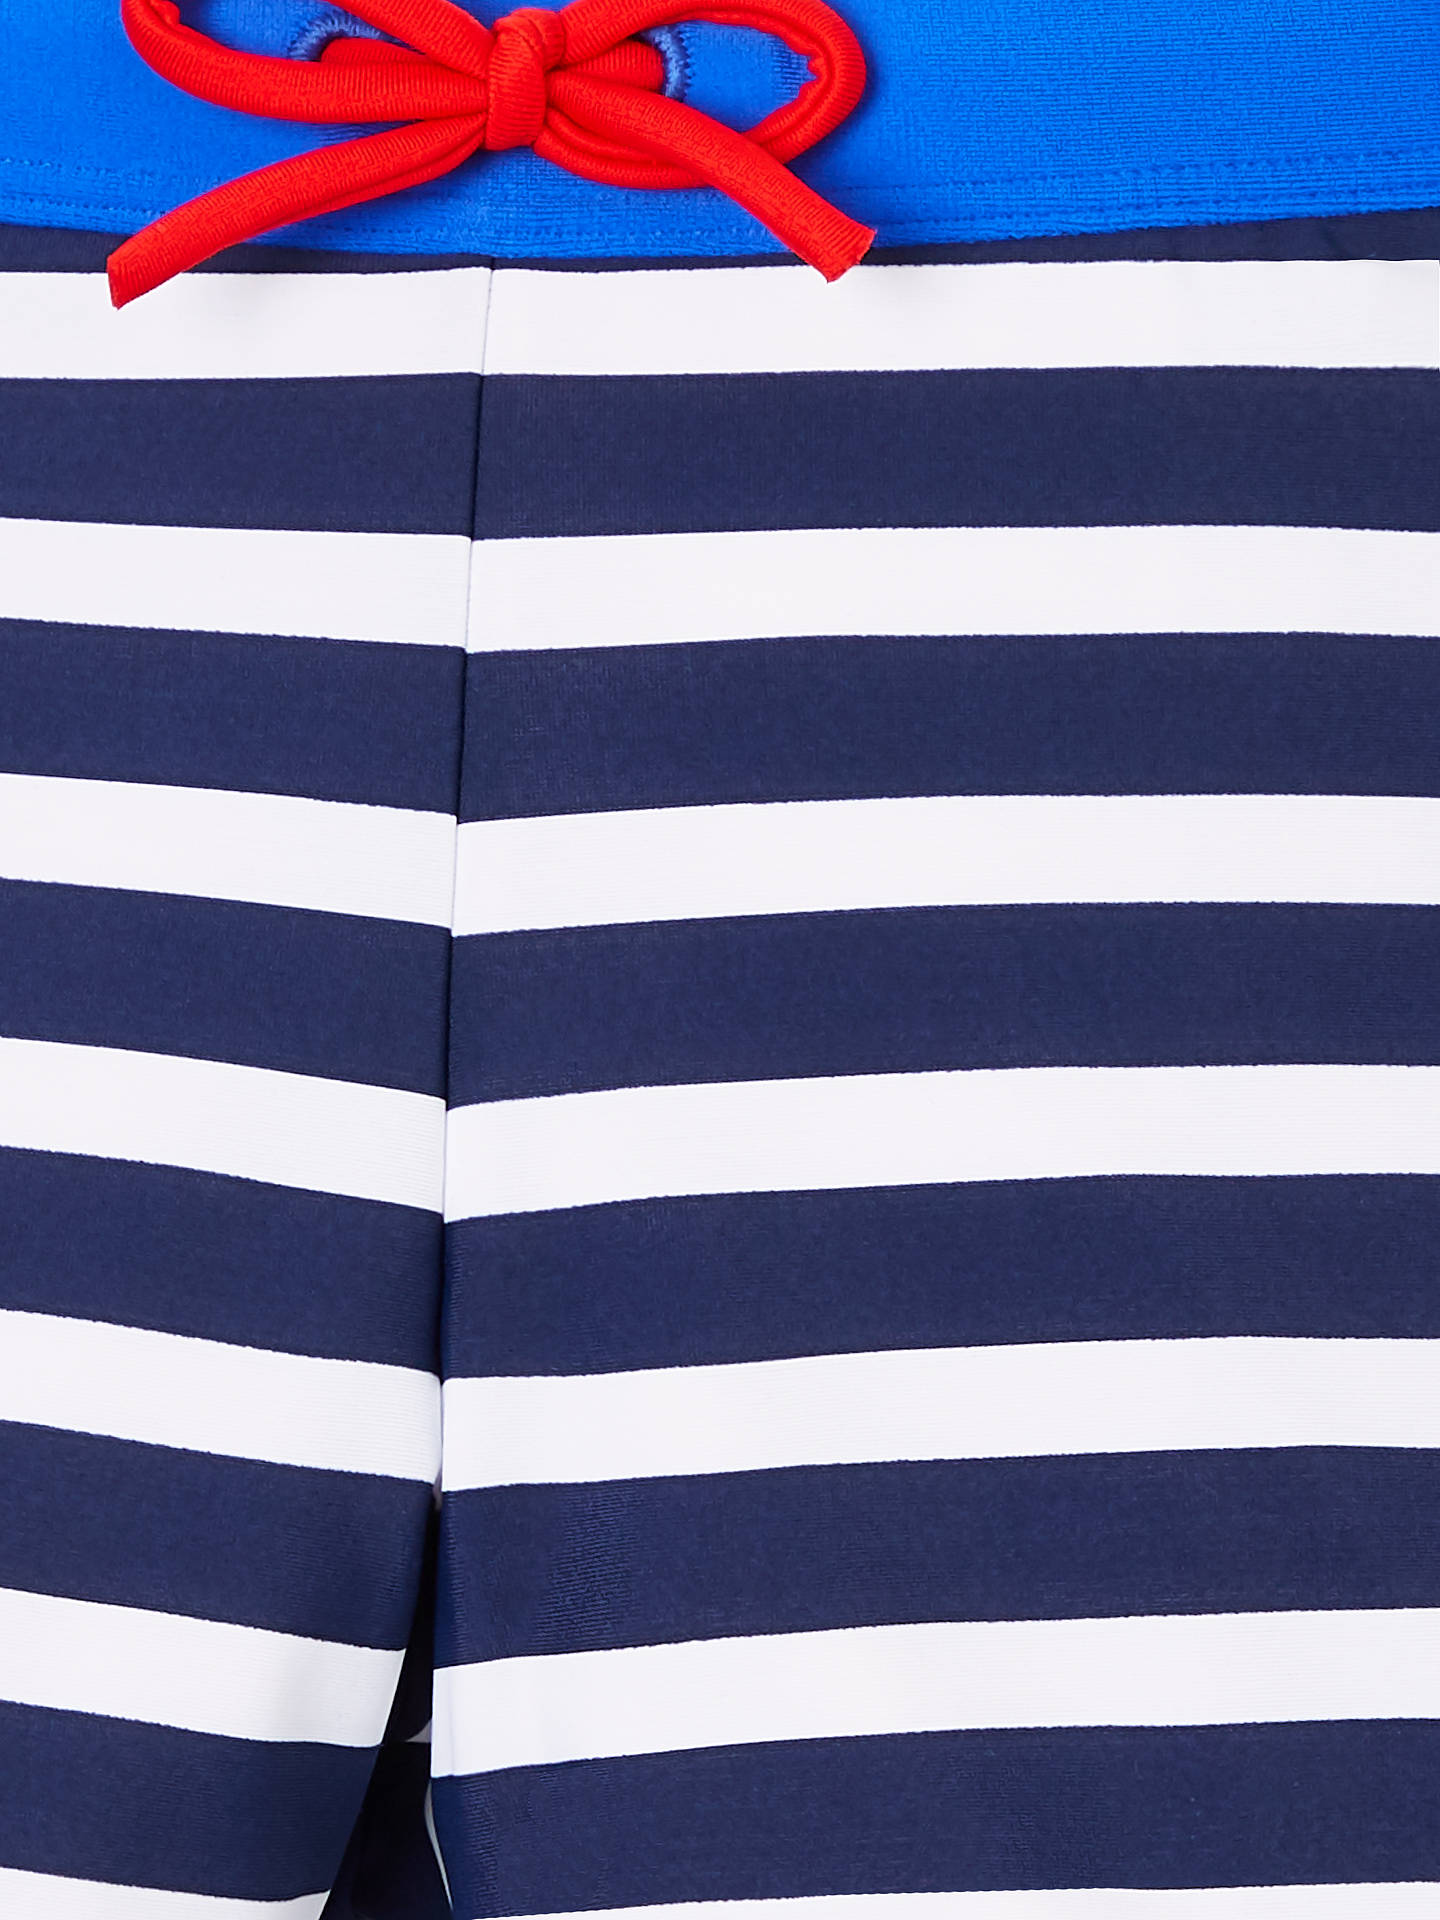 630c65cda ... Buy John Lewis   Partners Boys  Stripe Print Swimming Trunks